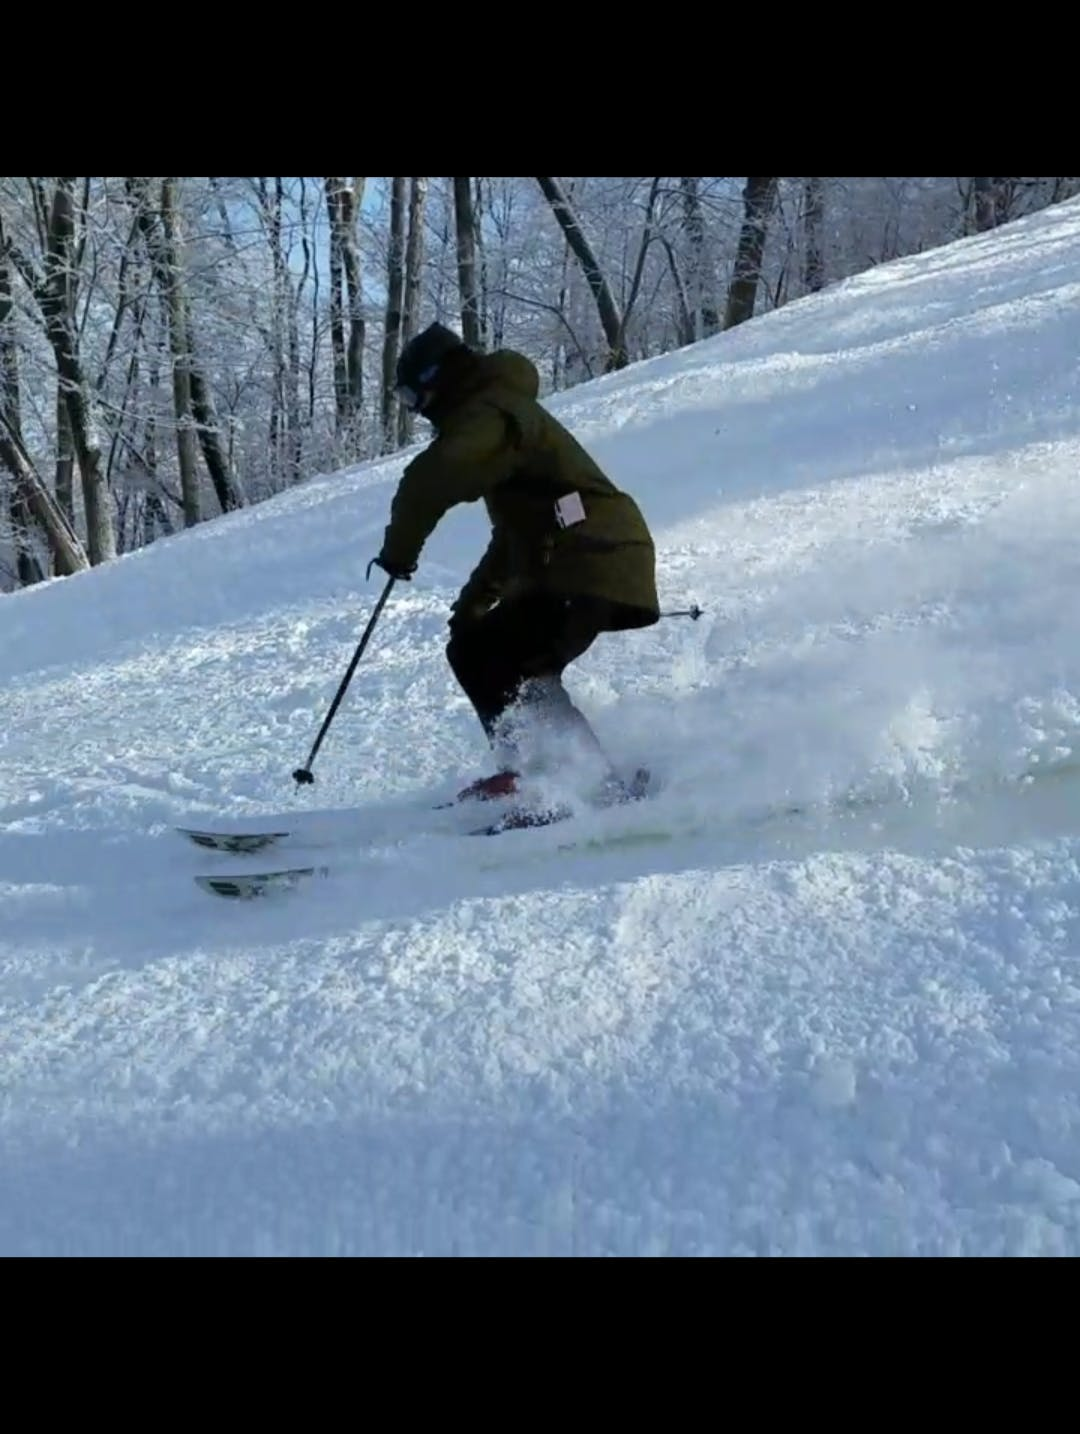 Ski Expert David DiMuzio